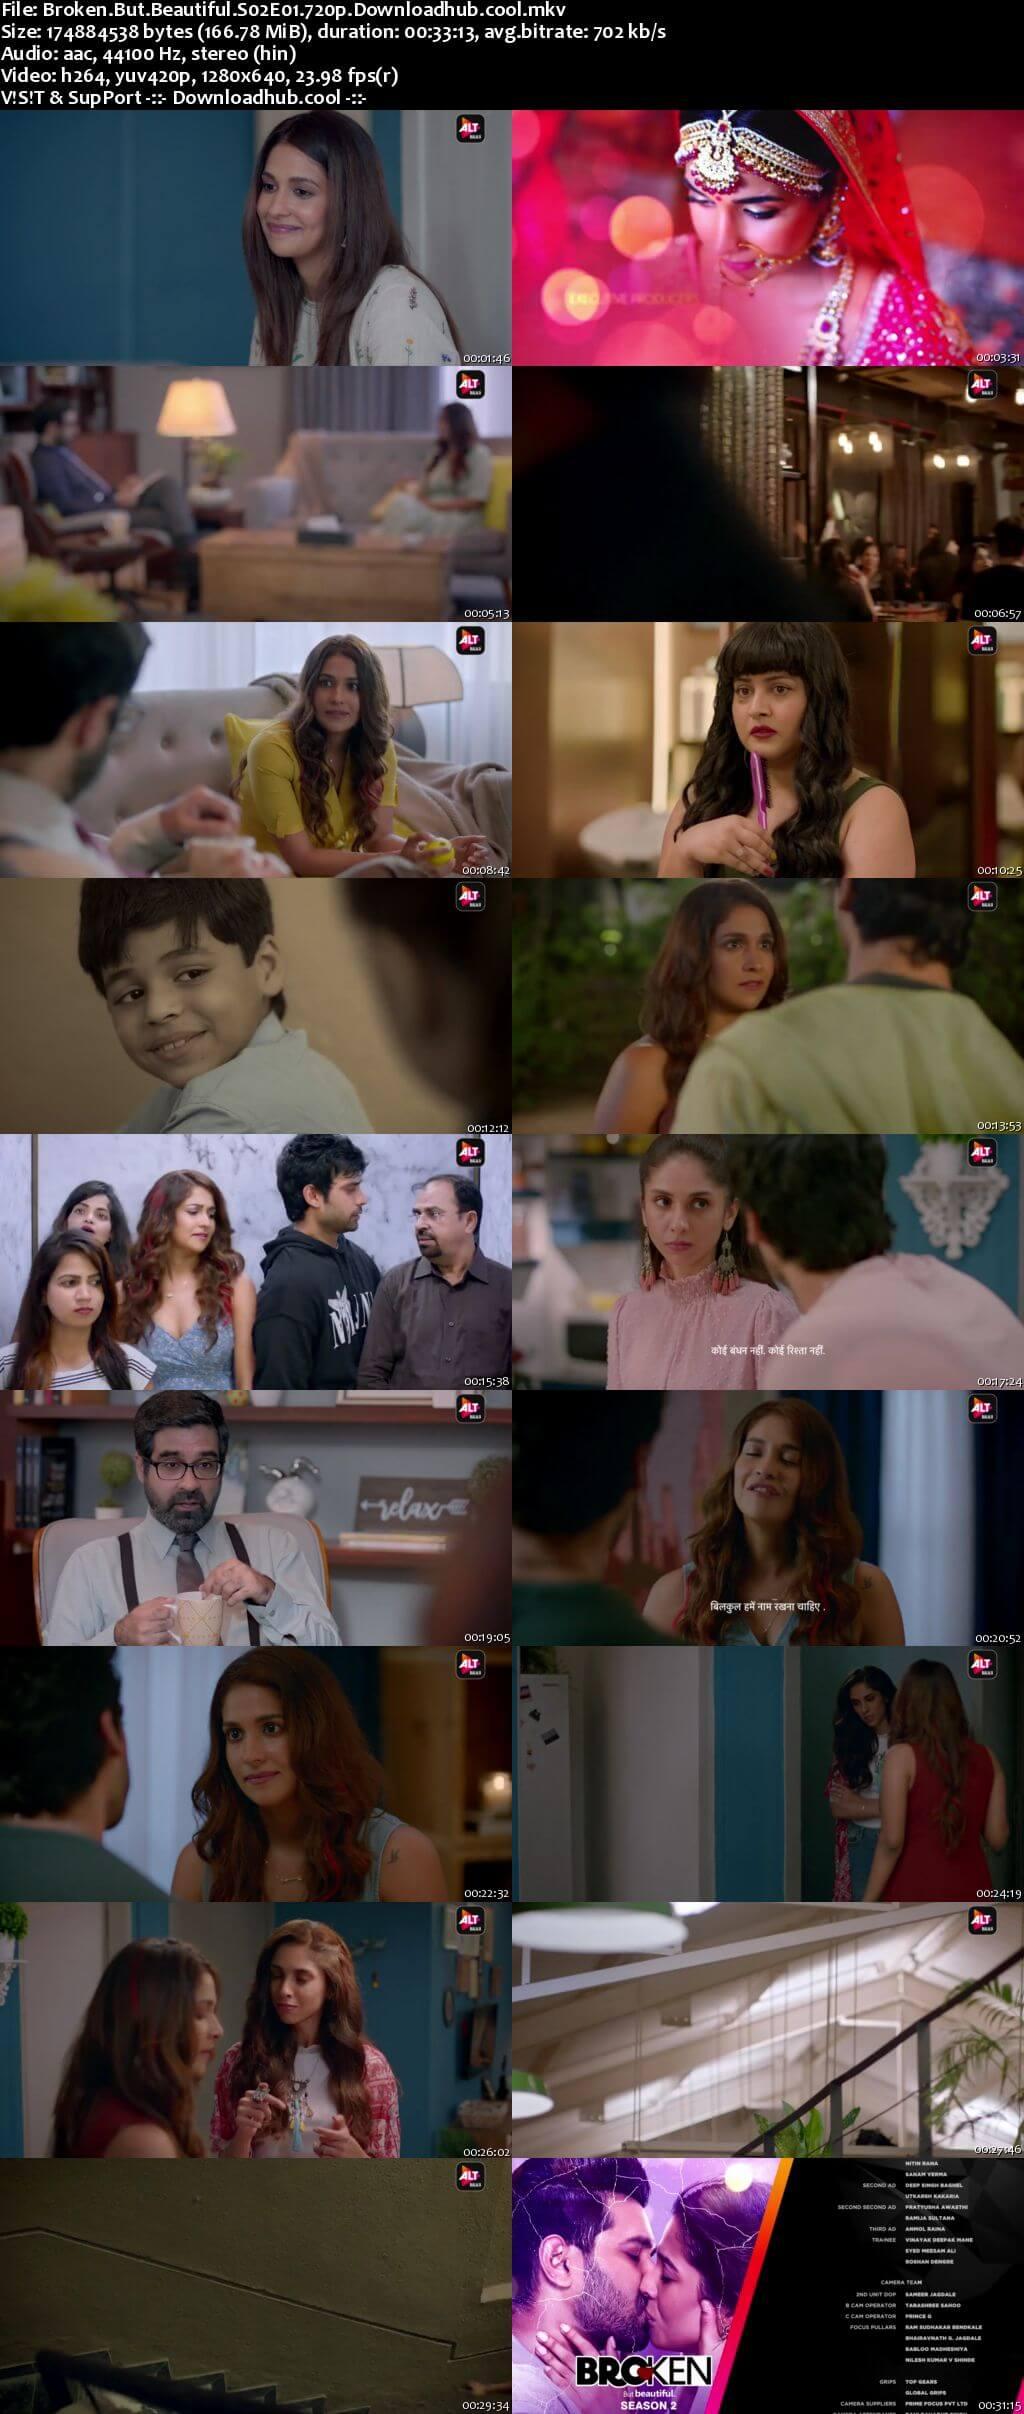 Broken But Beautiful 2019 Hindi Season 02 Complete 720p HDRip x264